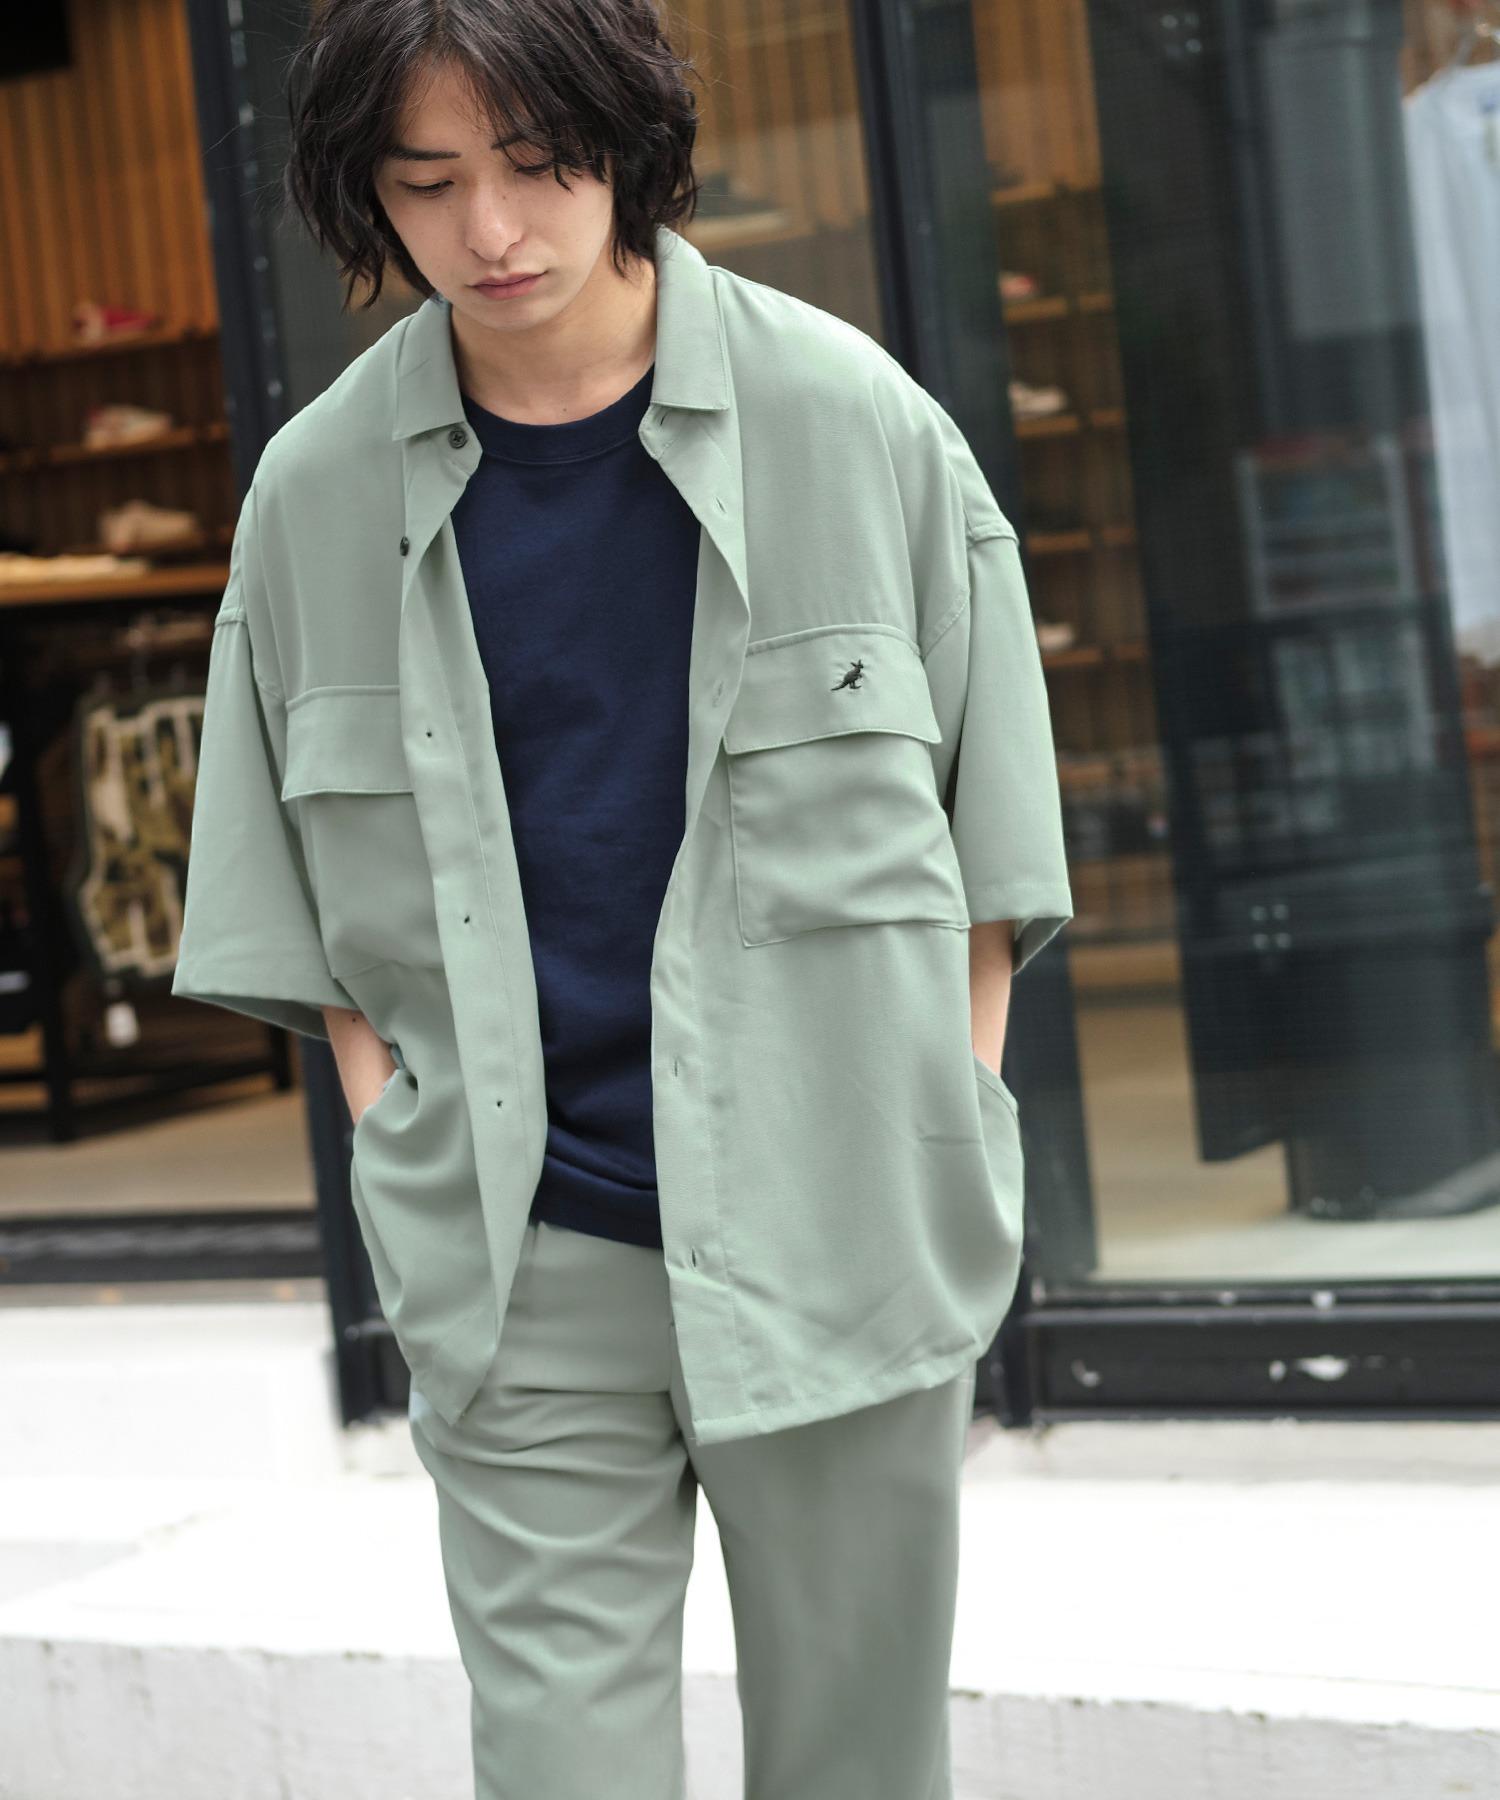 MONO-MART×KANGOL リラックスレギュラー クレリックカラー オーバーサイズ ドレープCPOシャツ(1/2 sleeve)